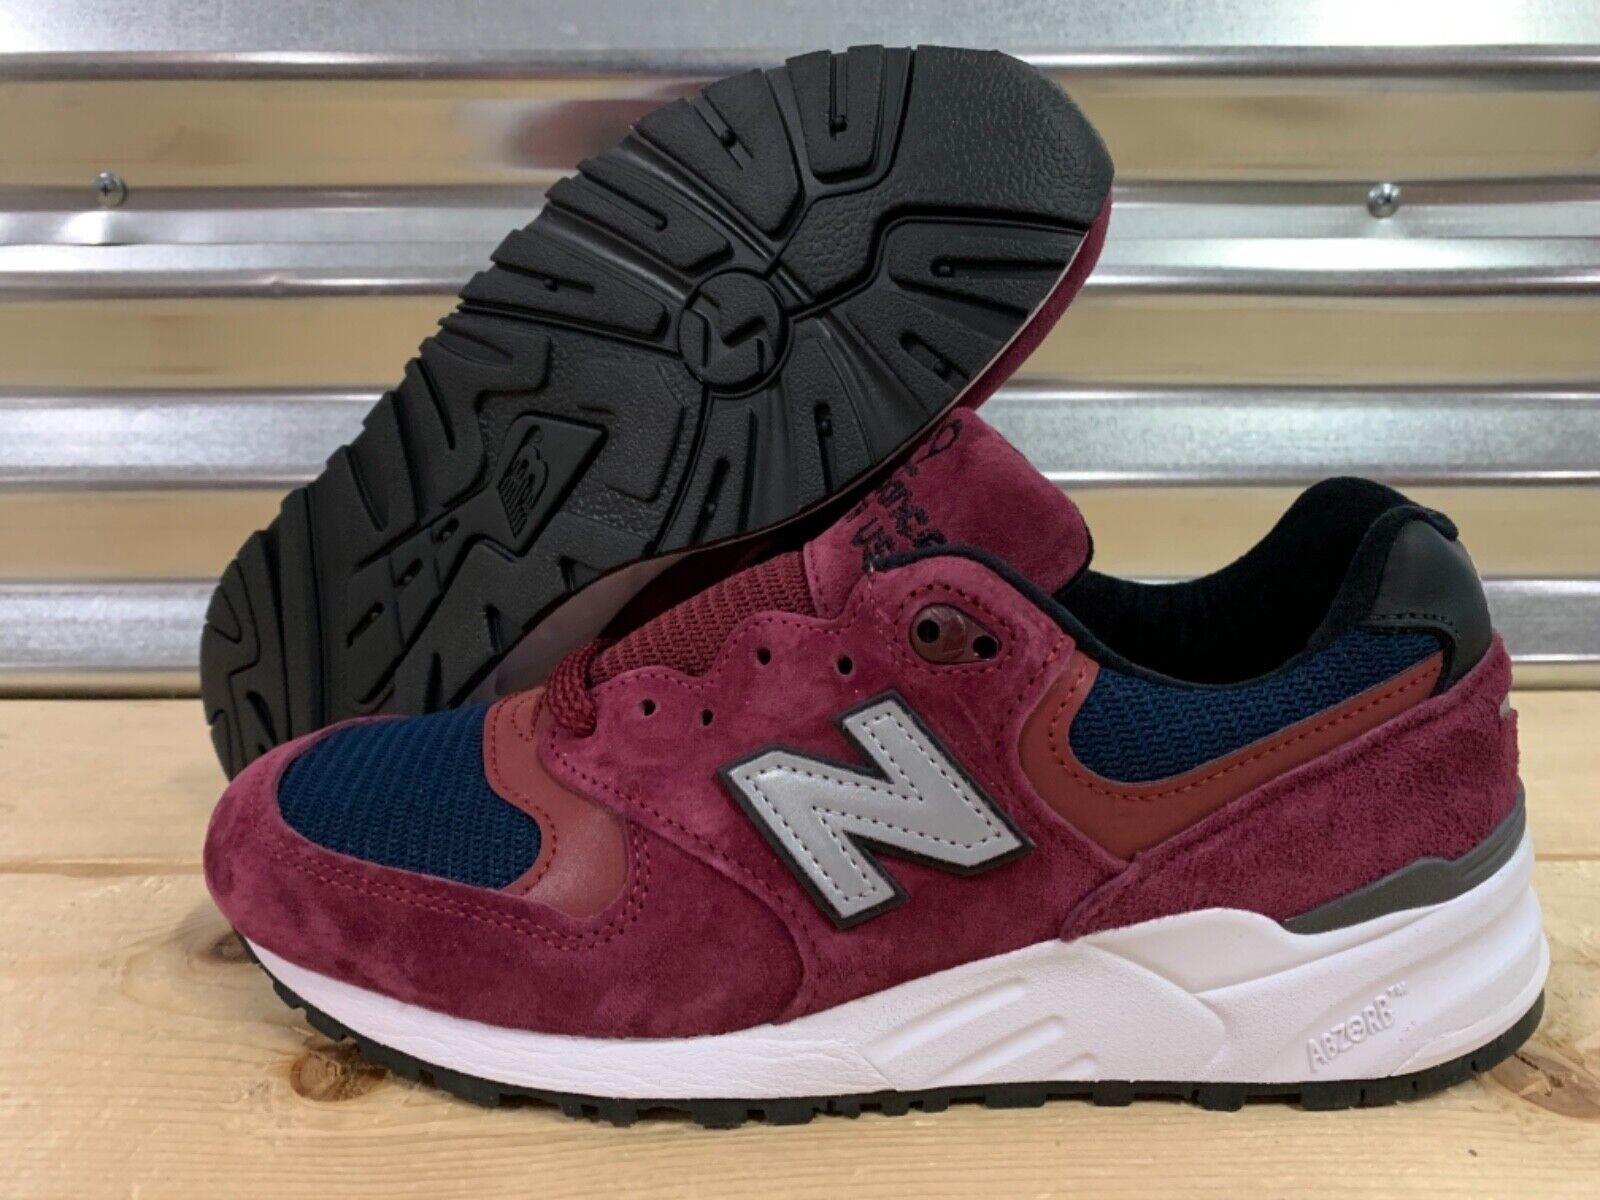 New Balance 999 Retro Suede shoes Burgundy Red Navy bluee USA SZ ( M999JTA )